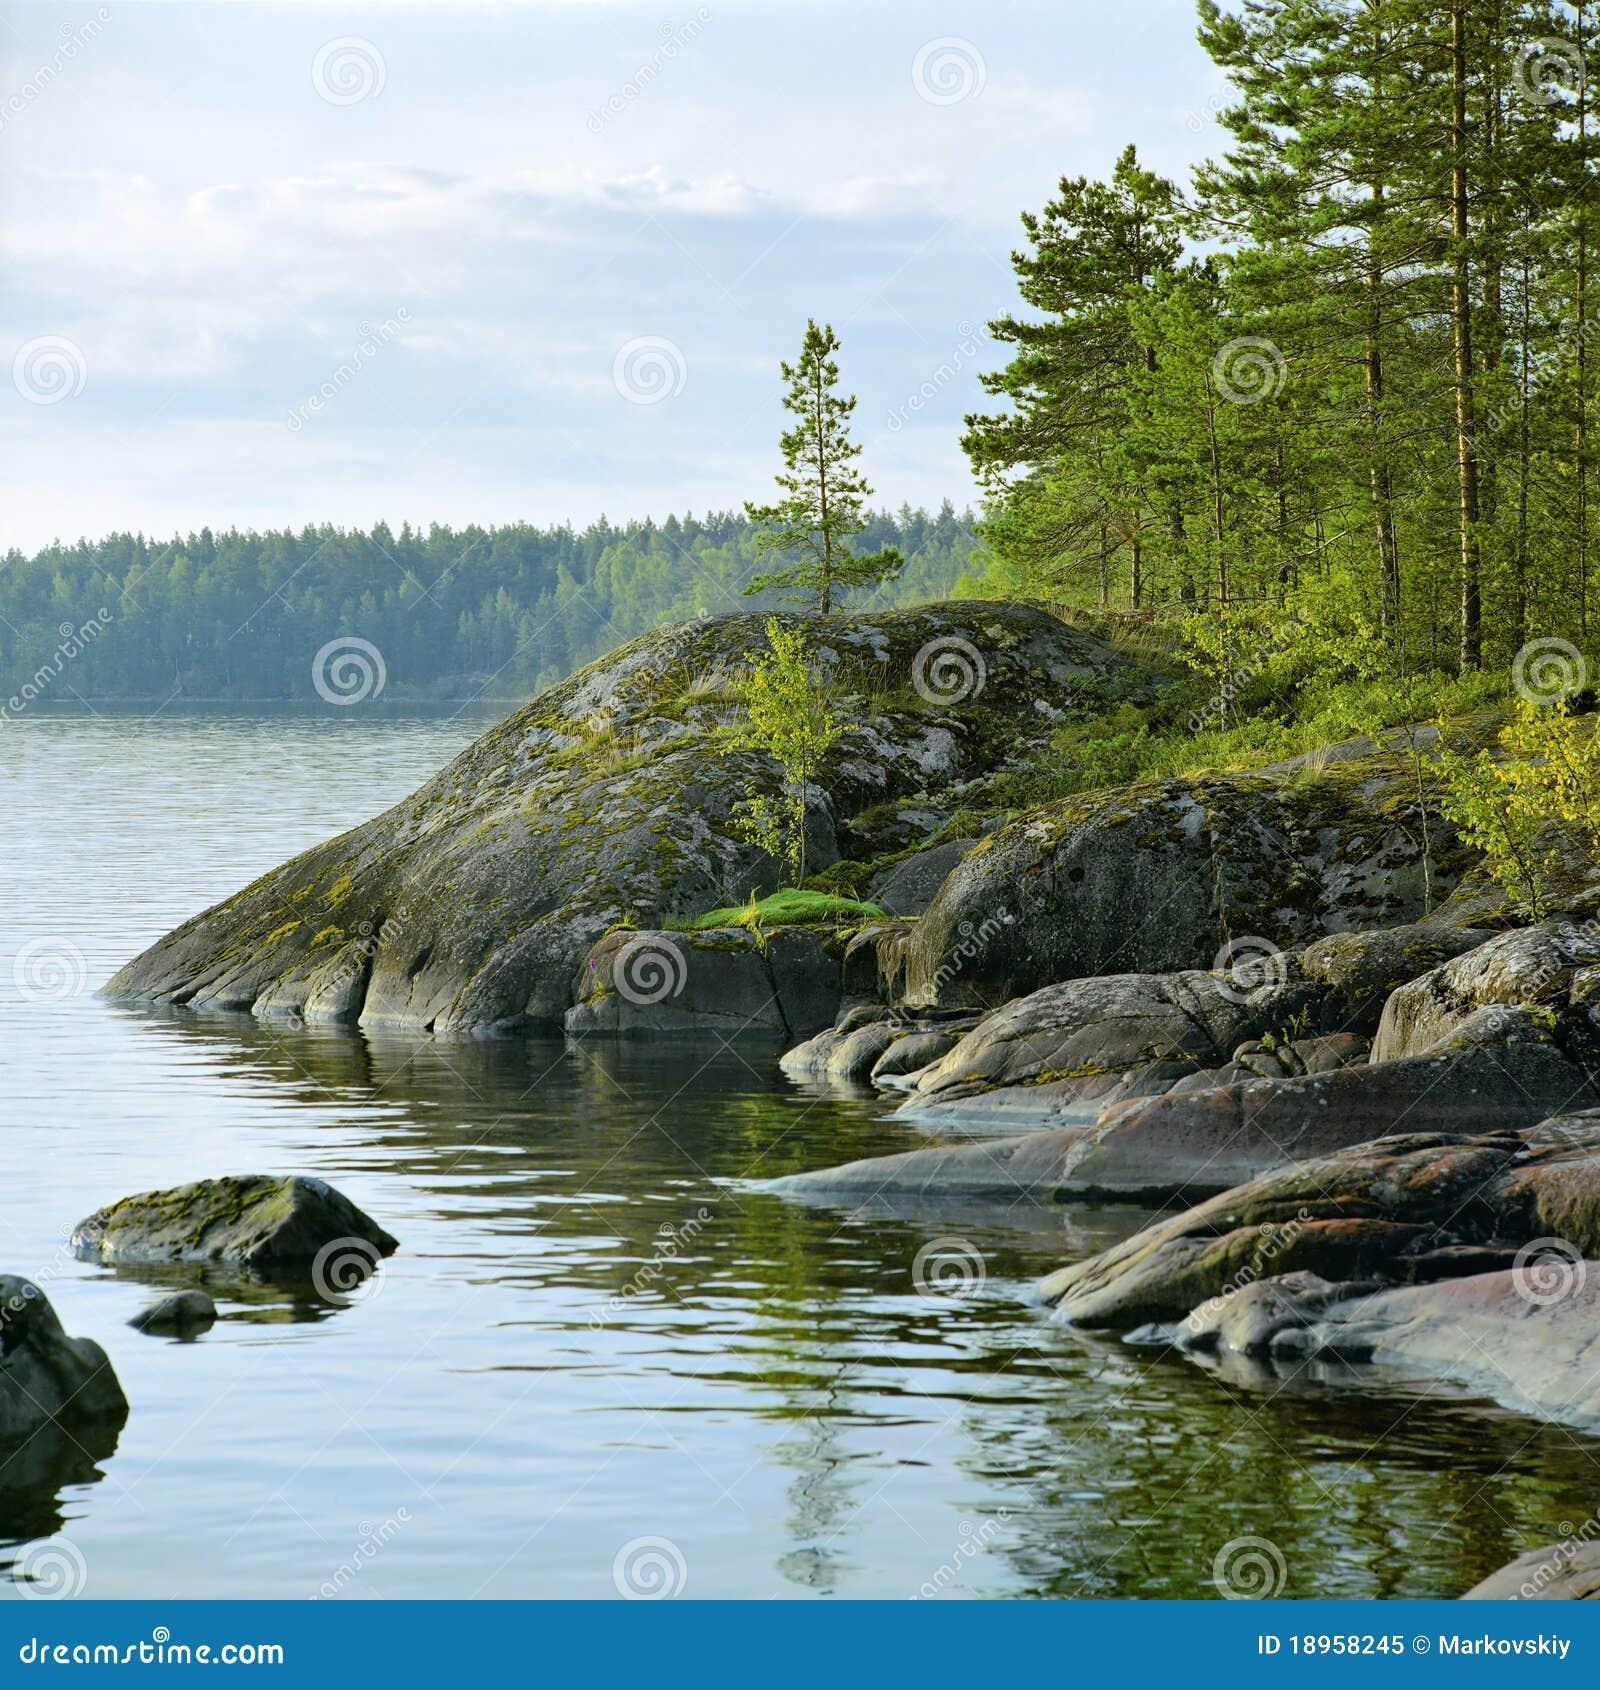 Stony Shore Of Ladoga Lake, Russia Stock Image - Image of ...